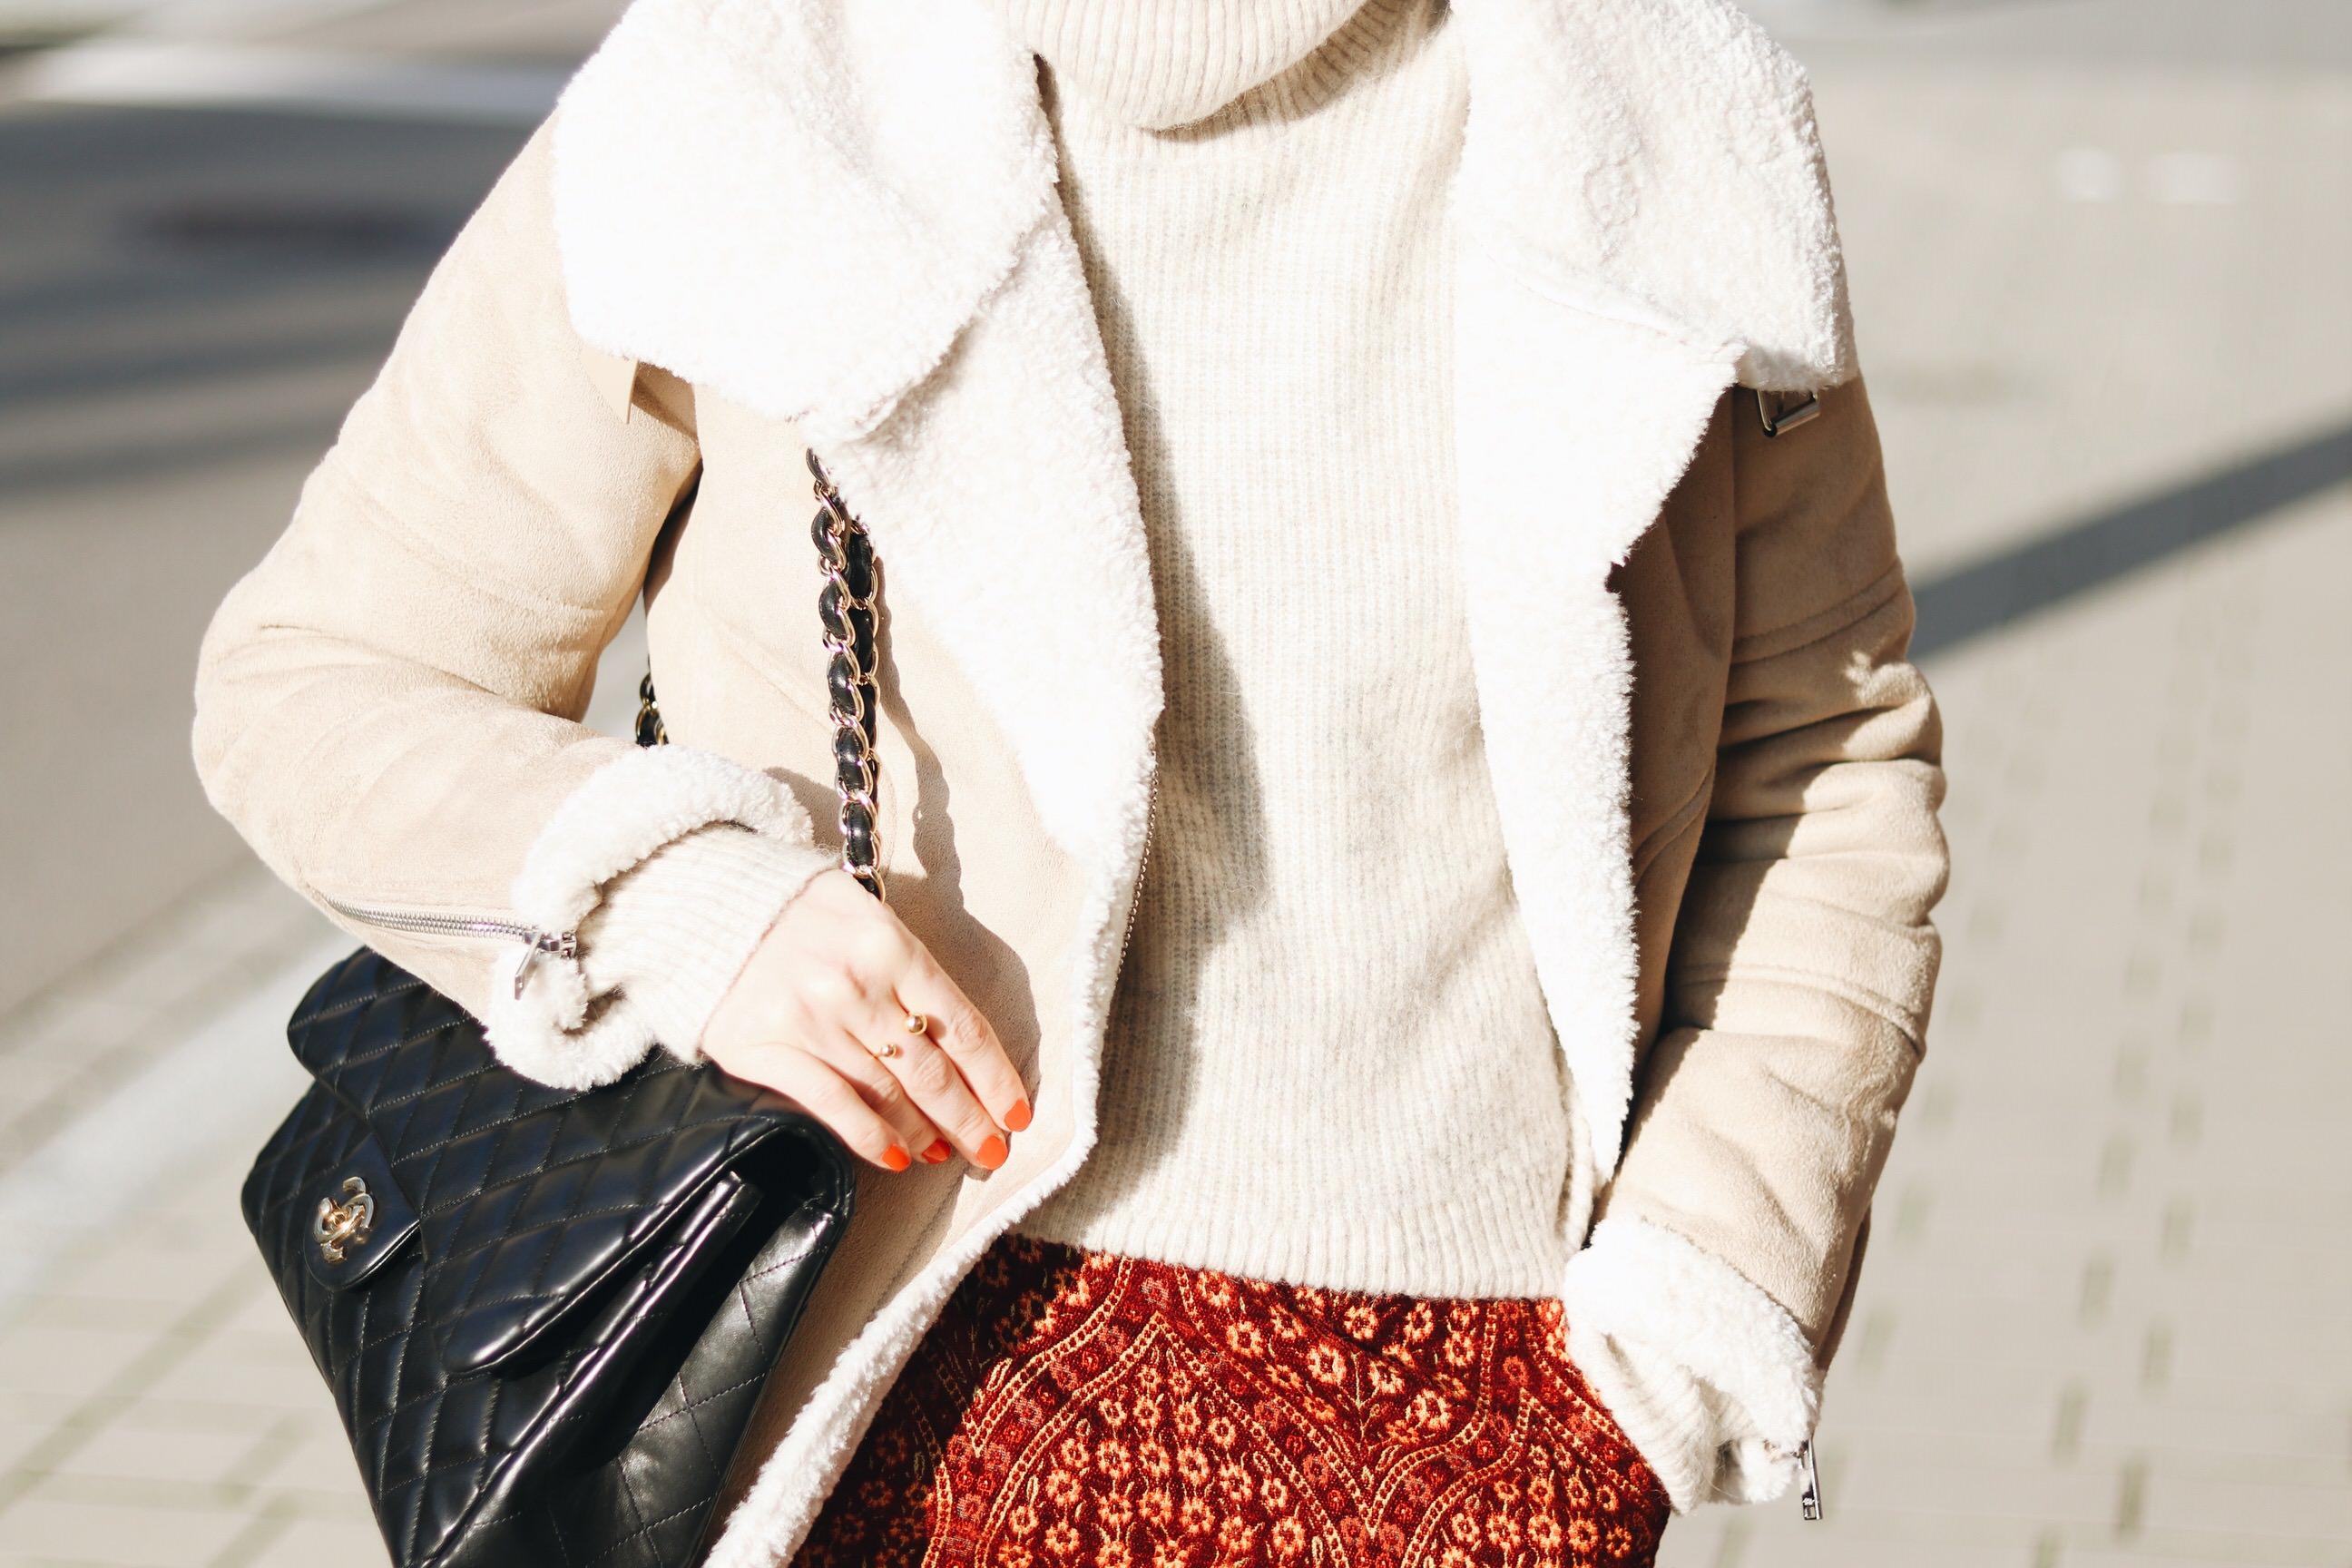 Lammfelljacke kombinieren Minirock Winter Outfit Ideen BLog Deutschland deutsch Chanel Tasche